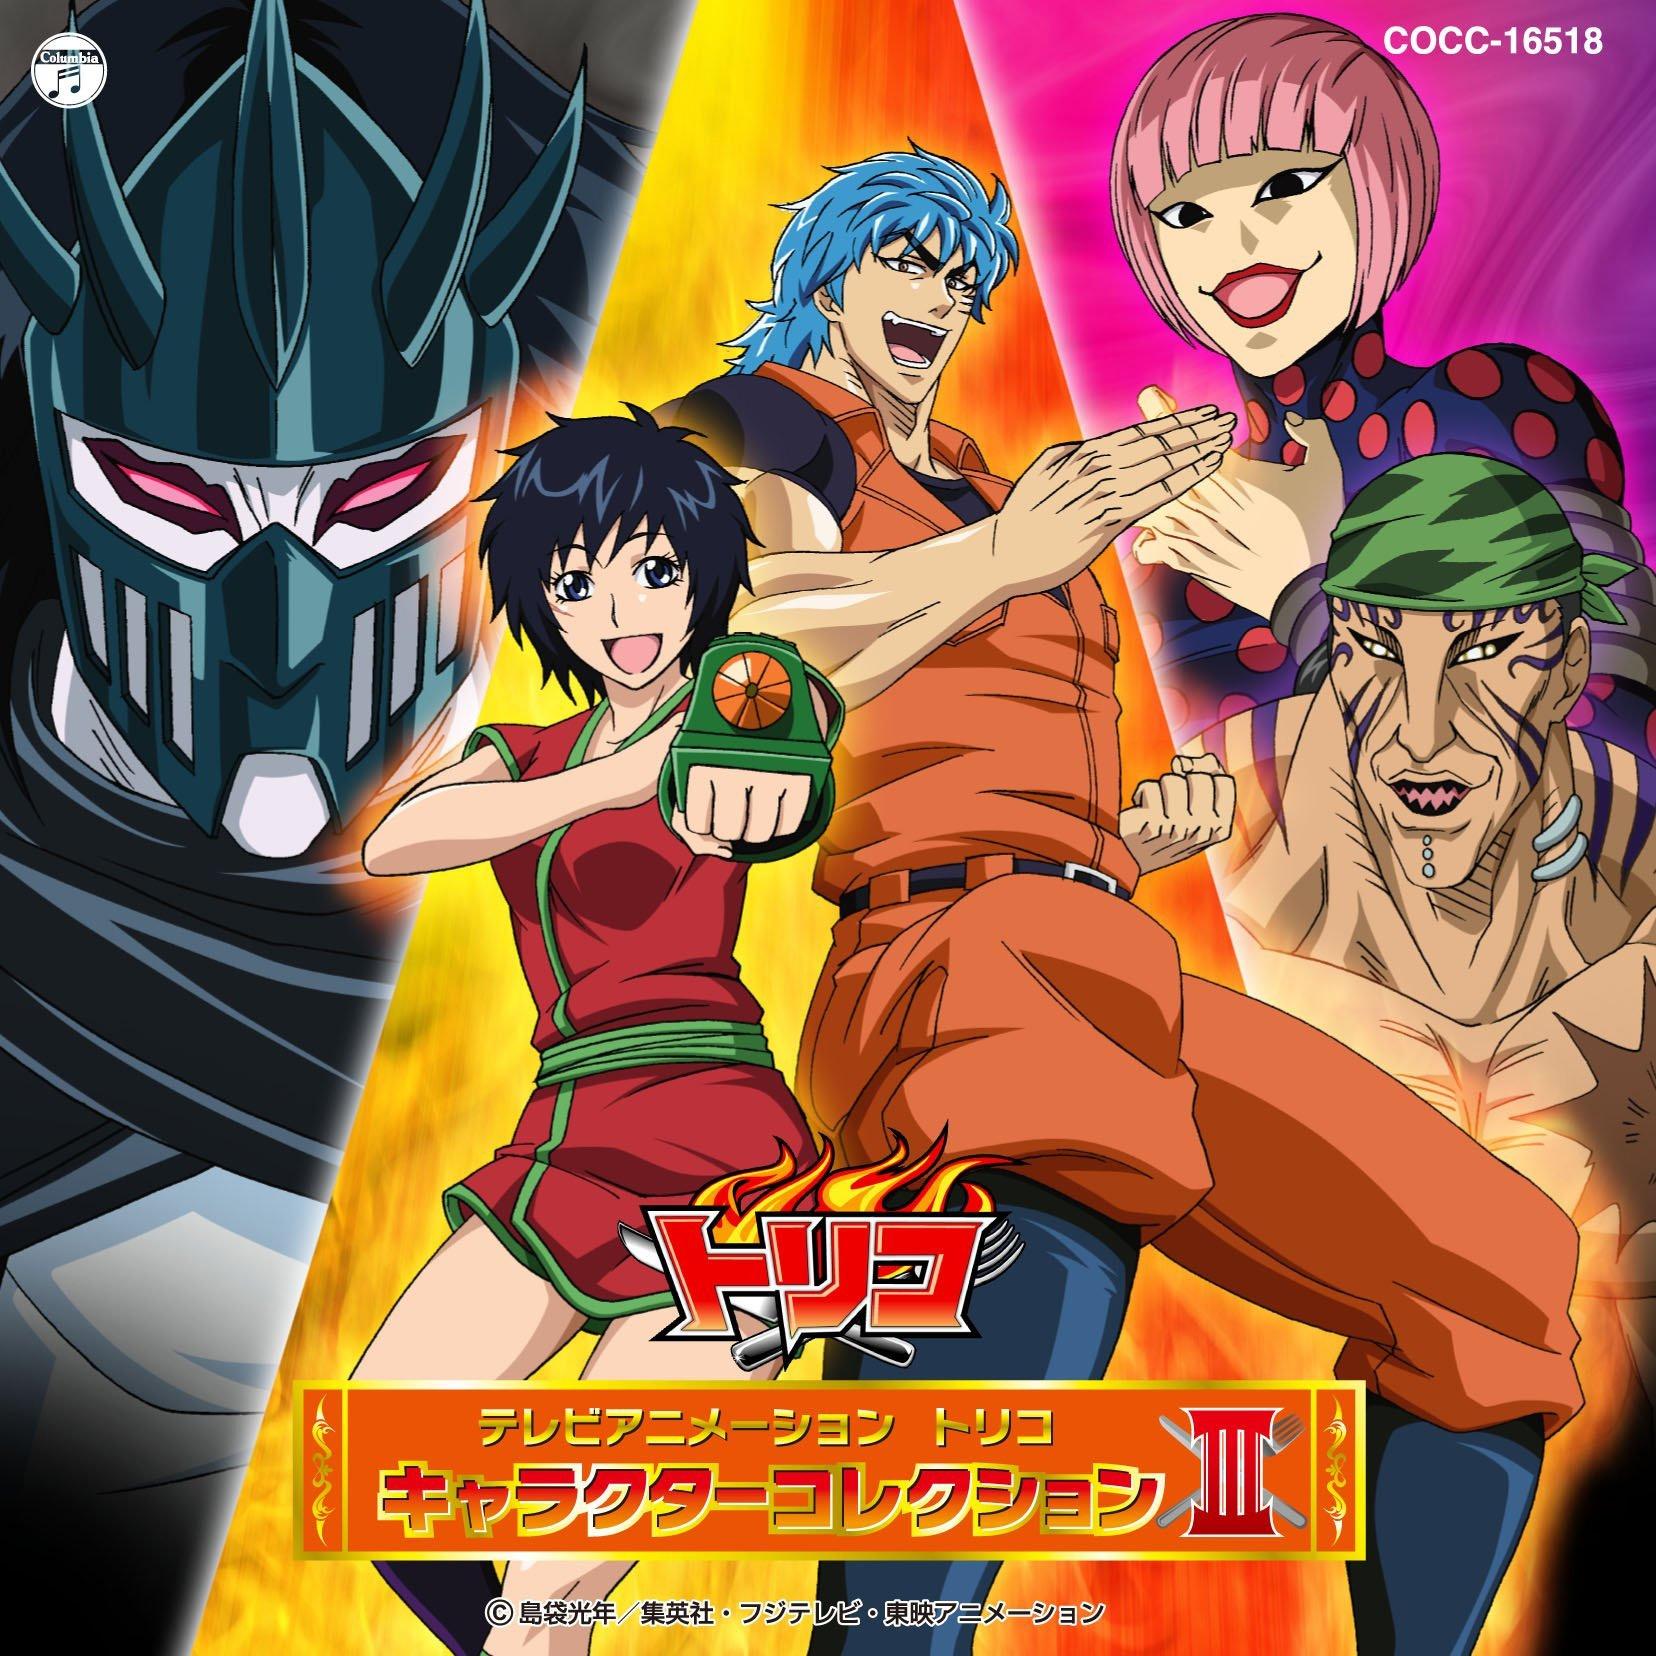 My Mangas Blog: Toriko 87 Vostfr